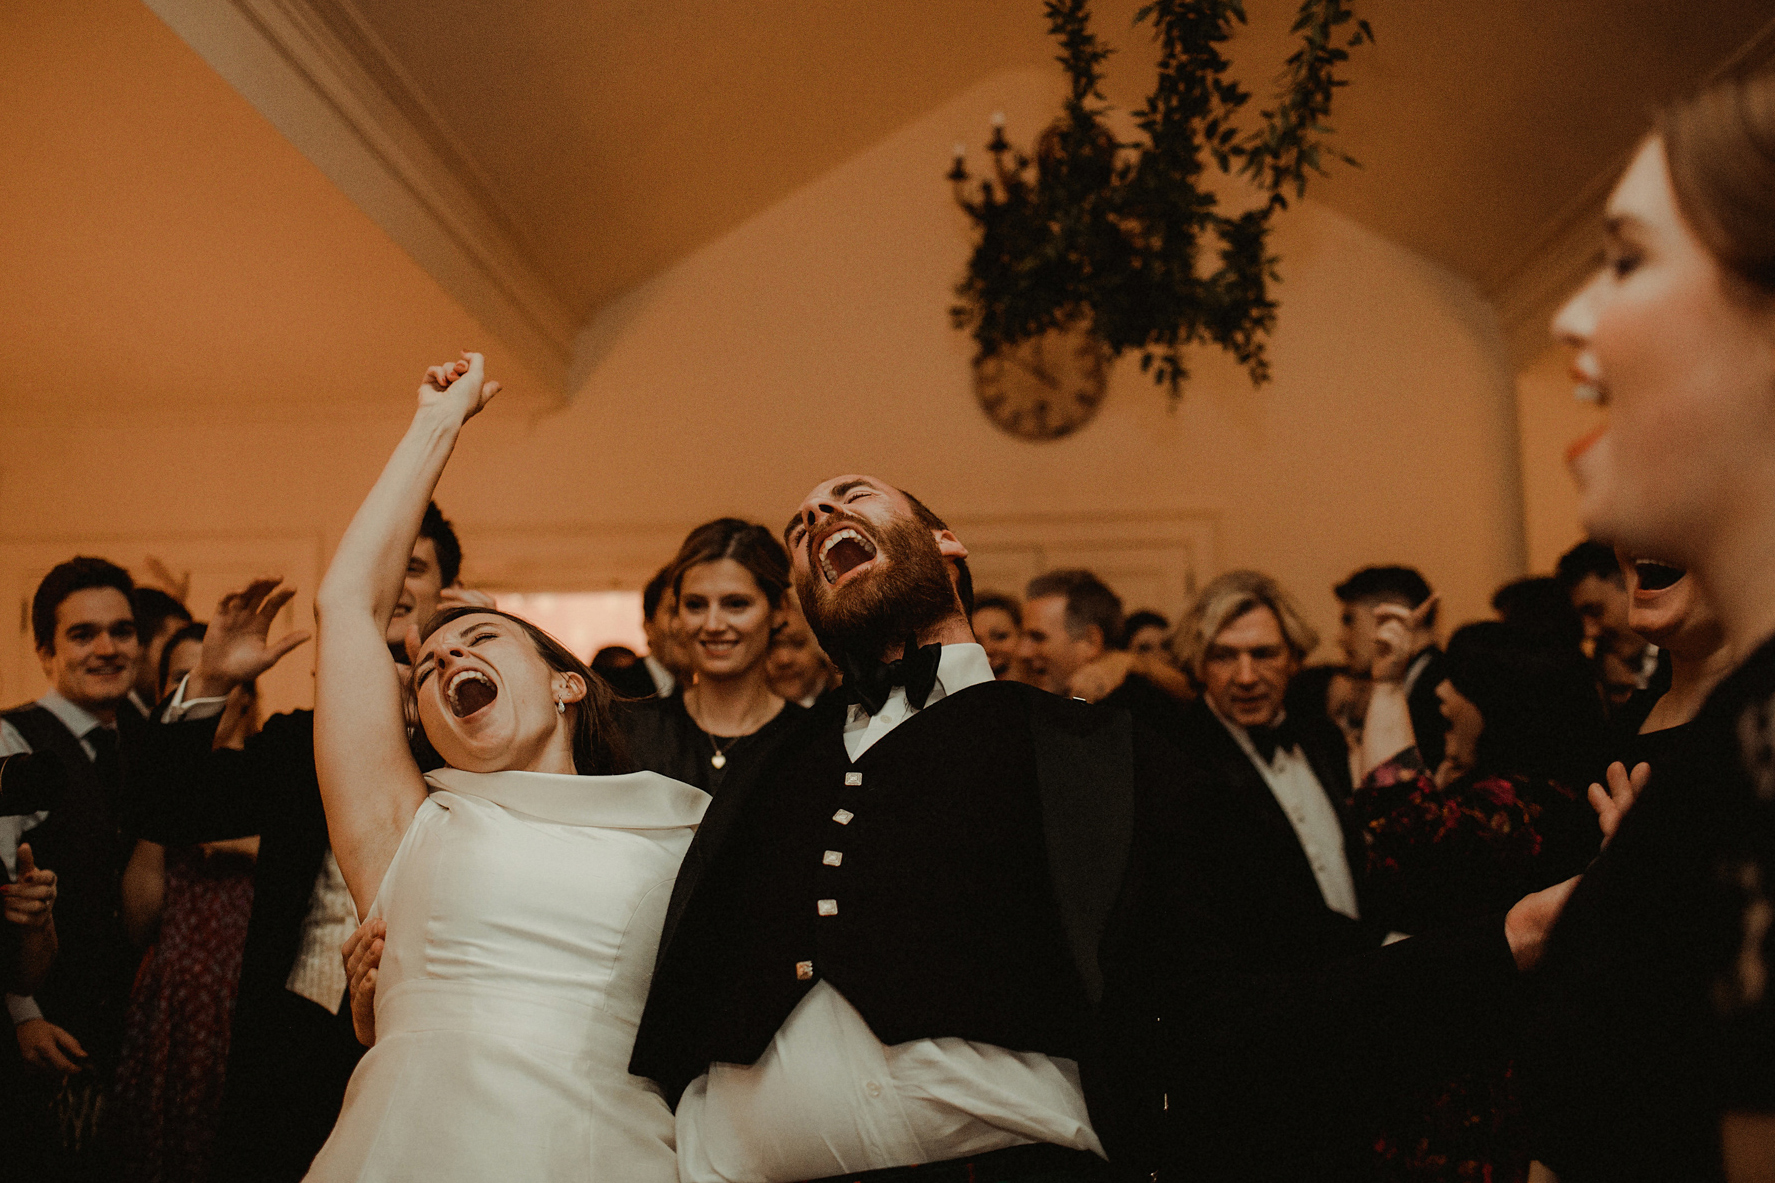 Glentruim-Wedding-Nikki-Leadbetter-Photography-387.jpg